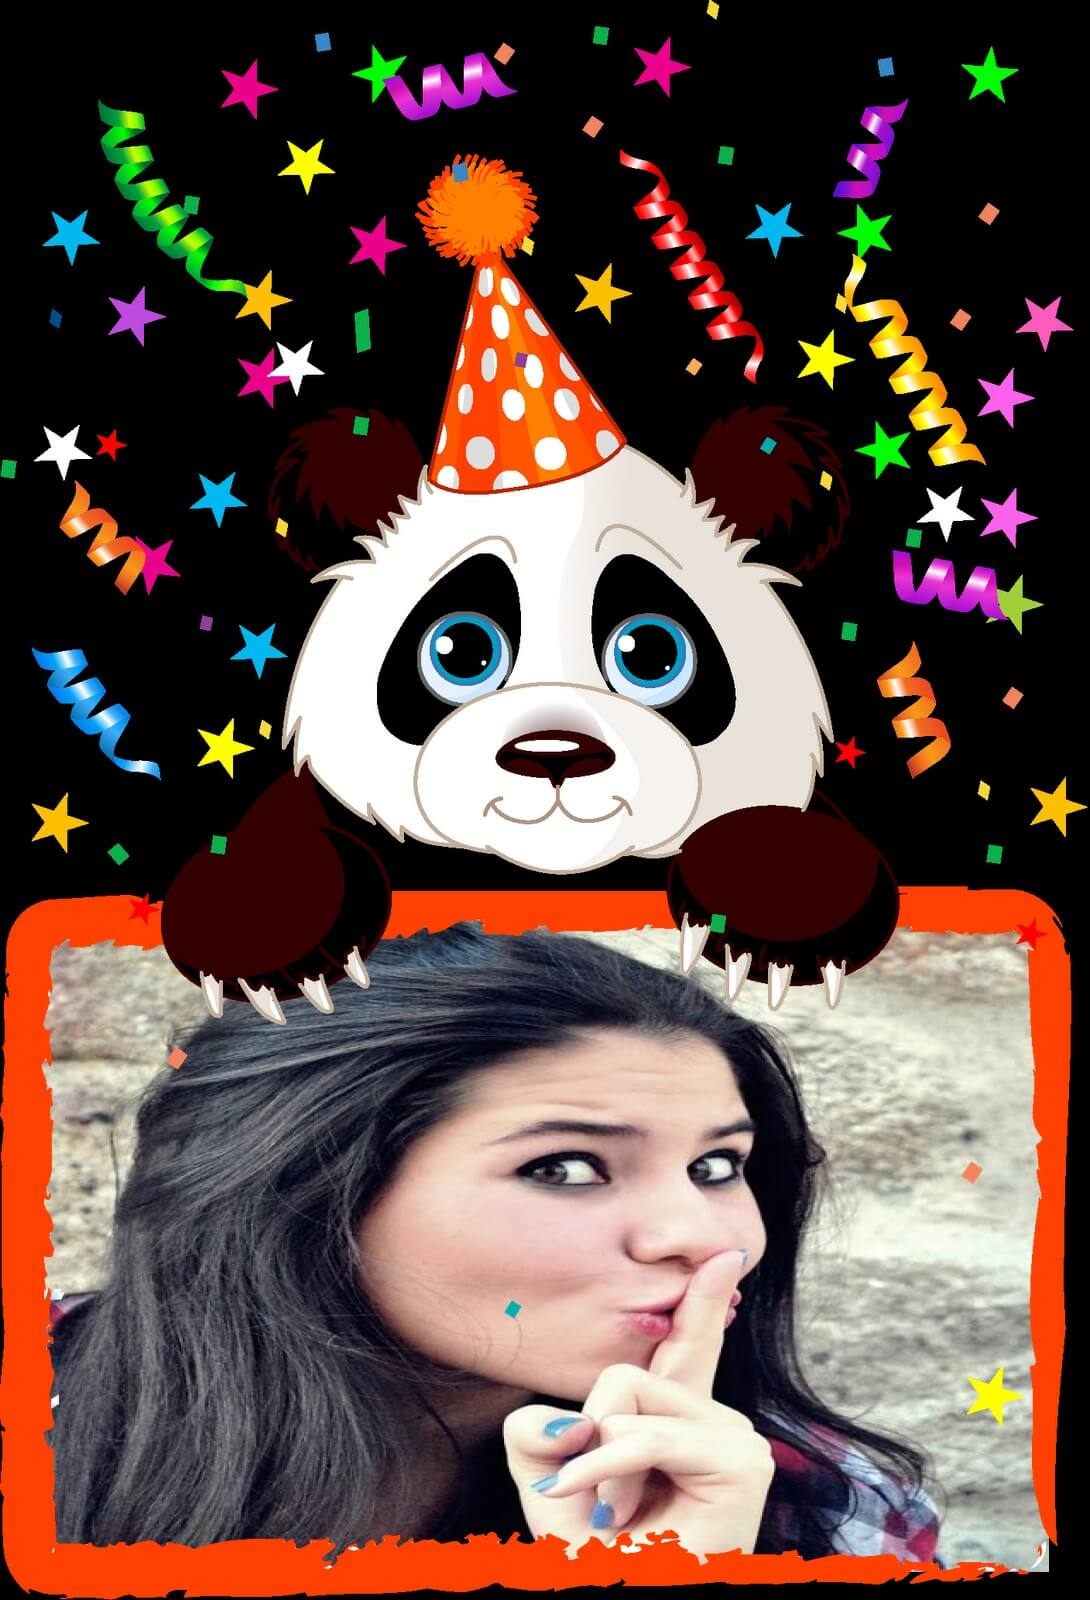 moldura-ursinho-panda-para-aniversario-